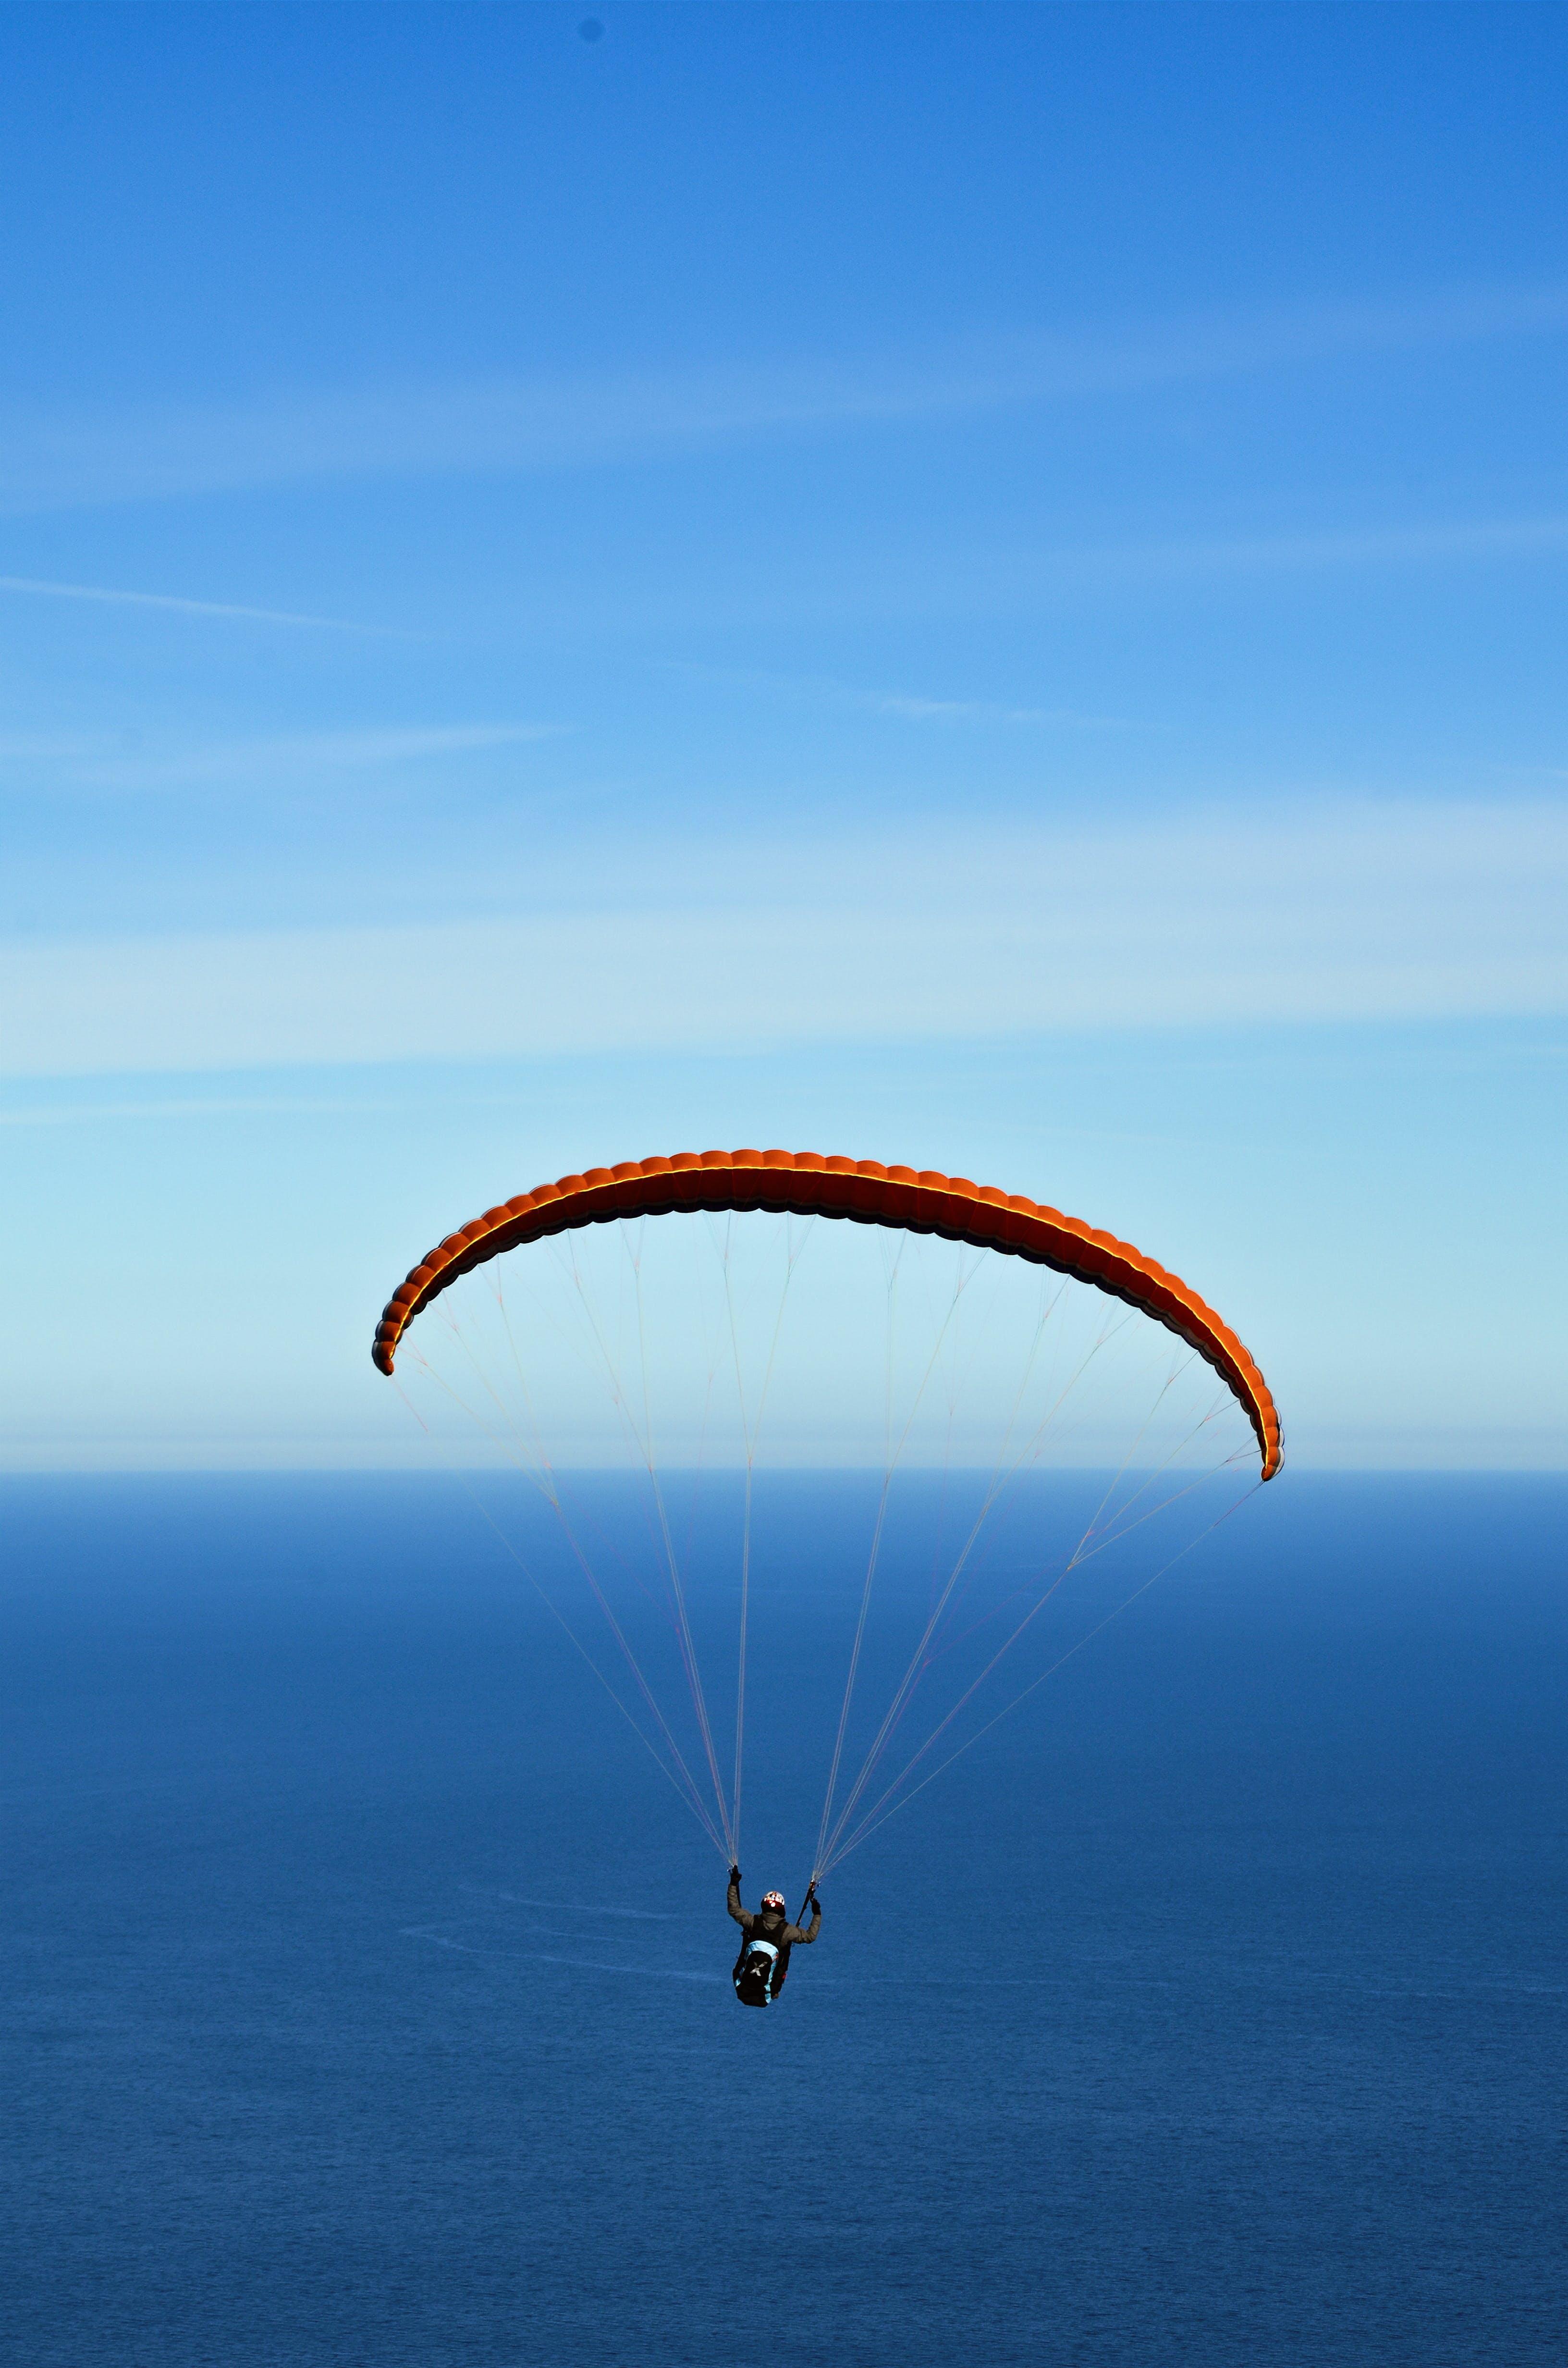 Man on Parachute over Blue Sea